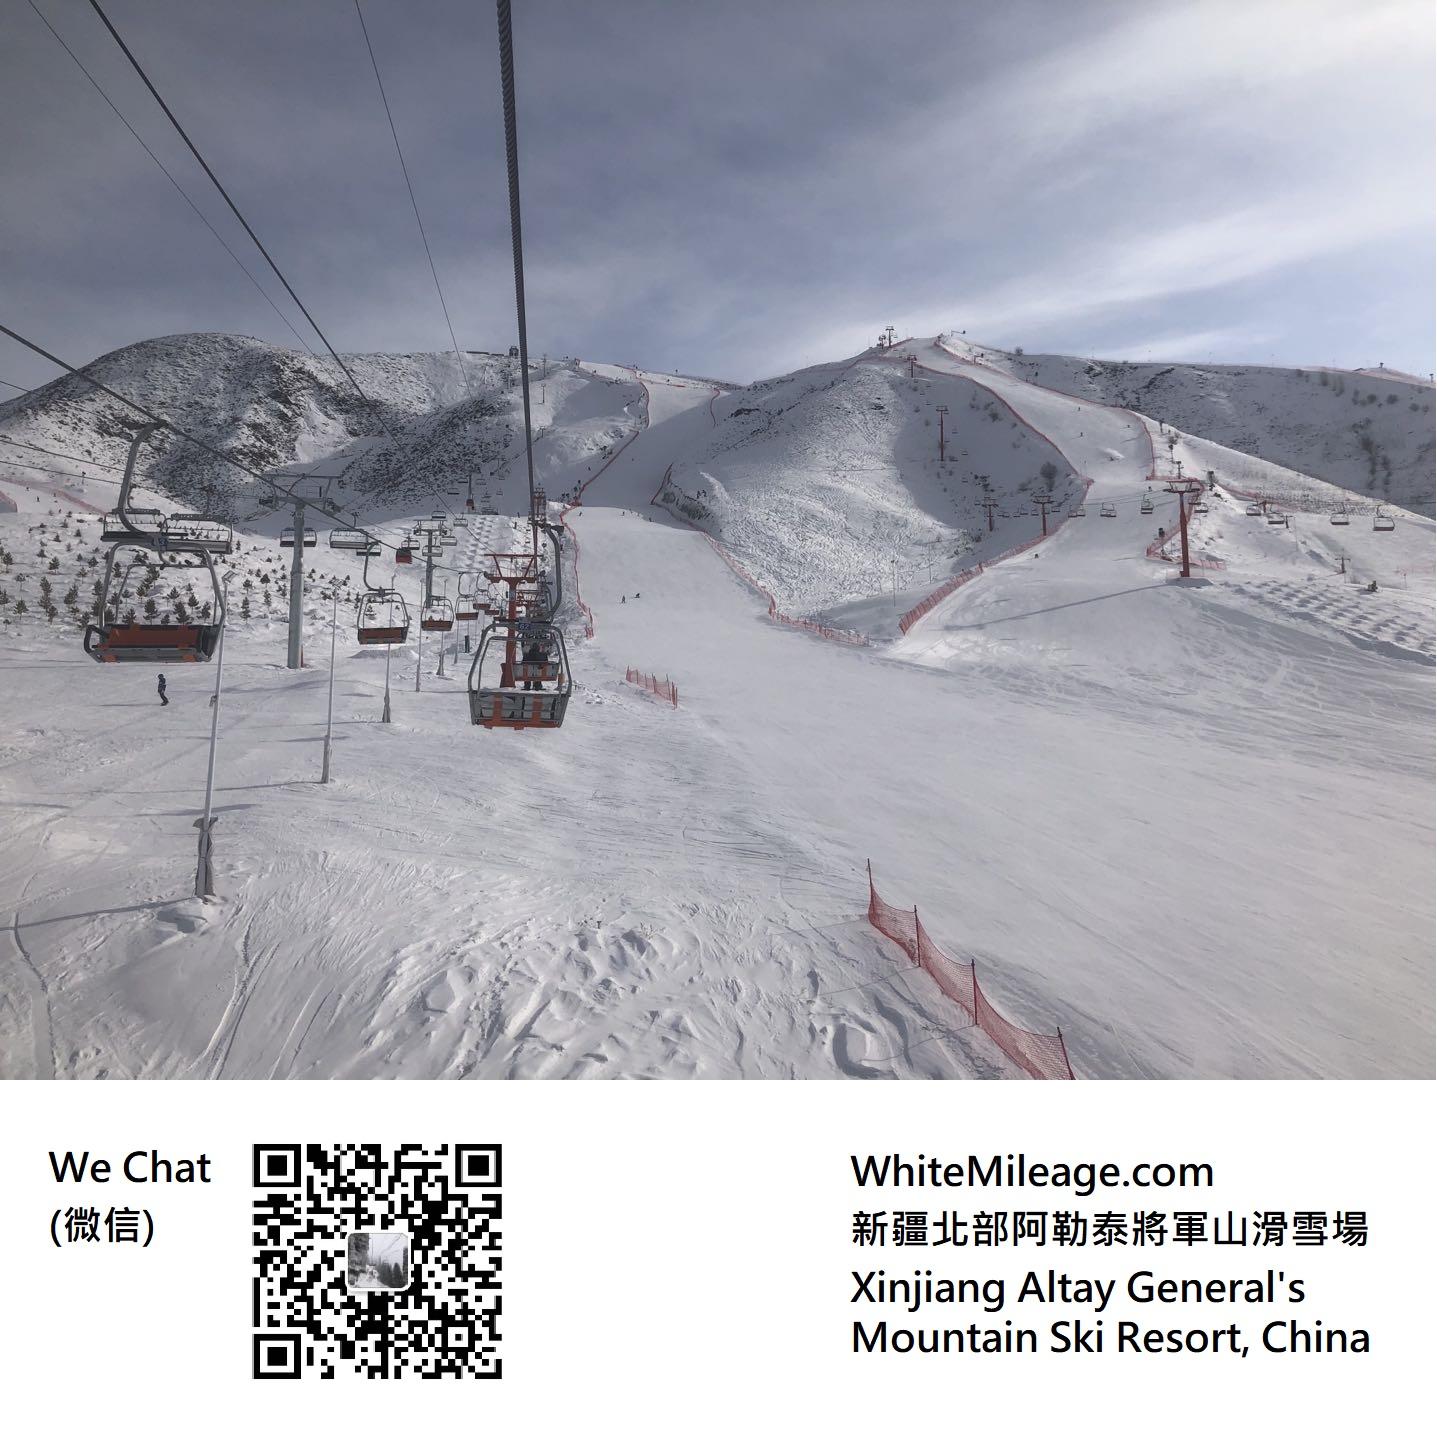 china-xinjiang-general-mountain-ski-resort-by-whitemileage-06